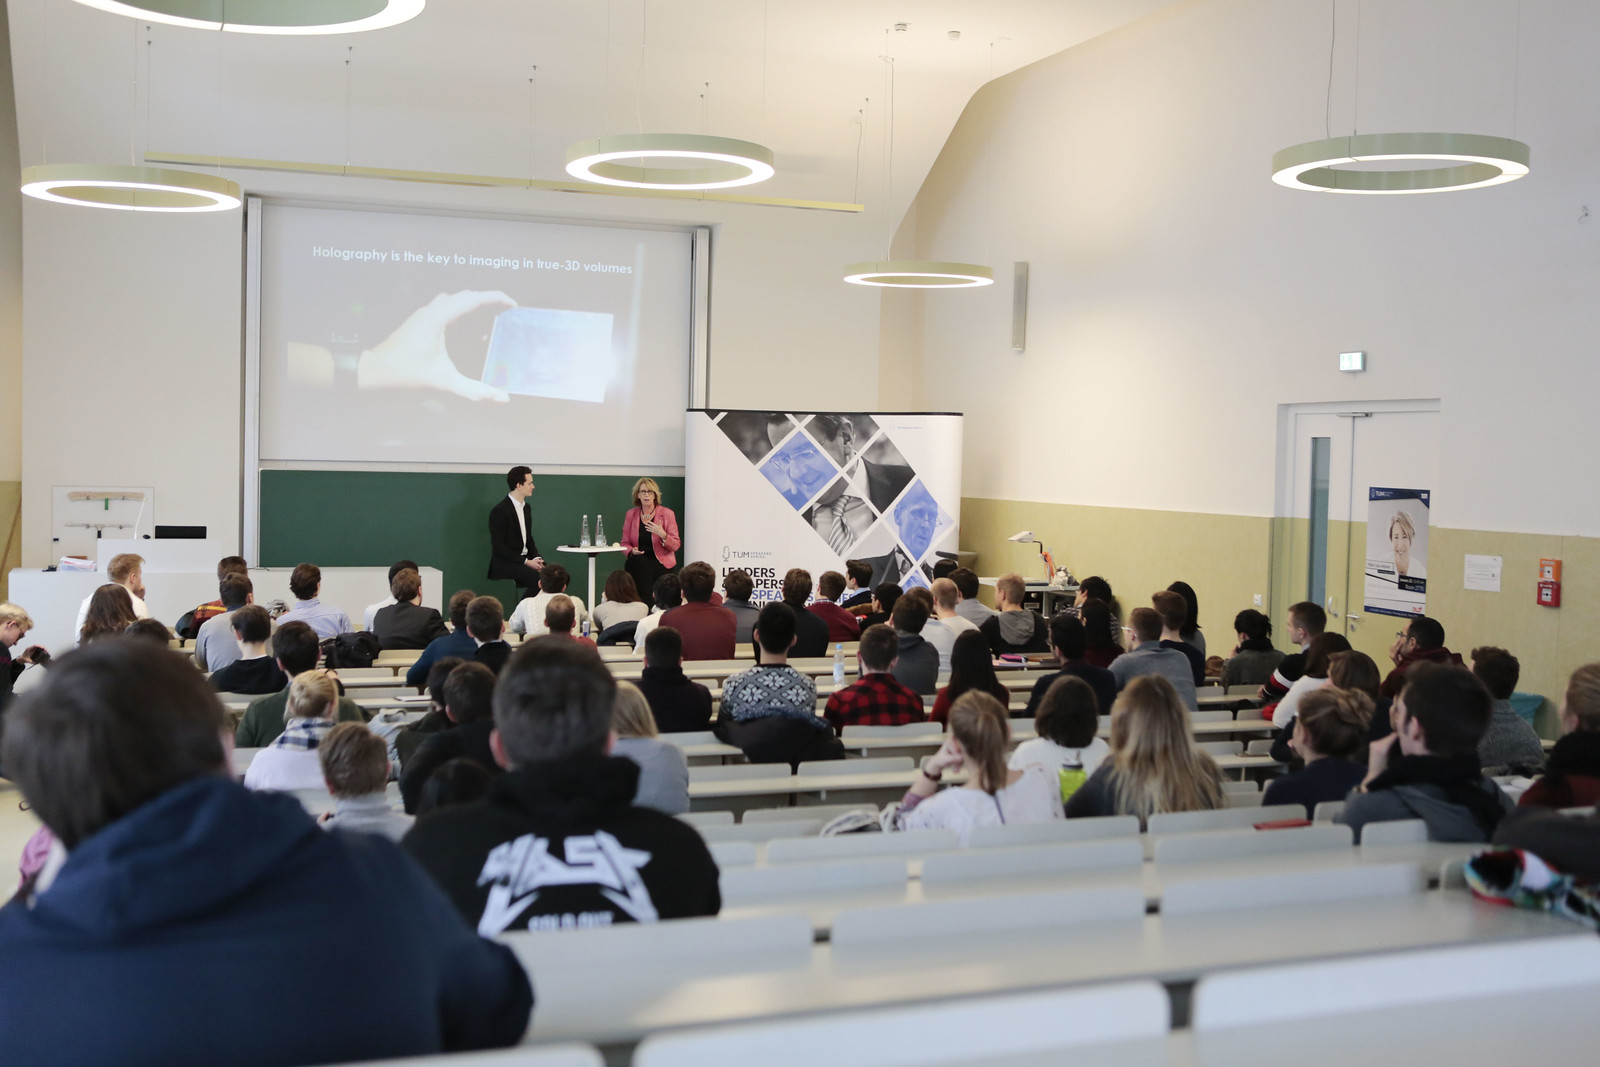 DLD Munich 18 - Studi Init Talk with Mary Lou Jepsen